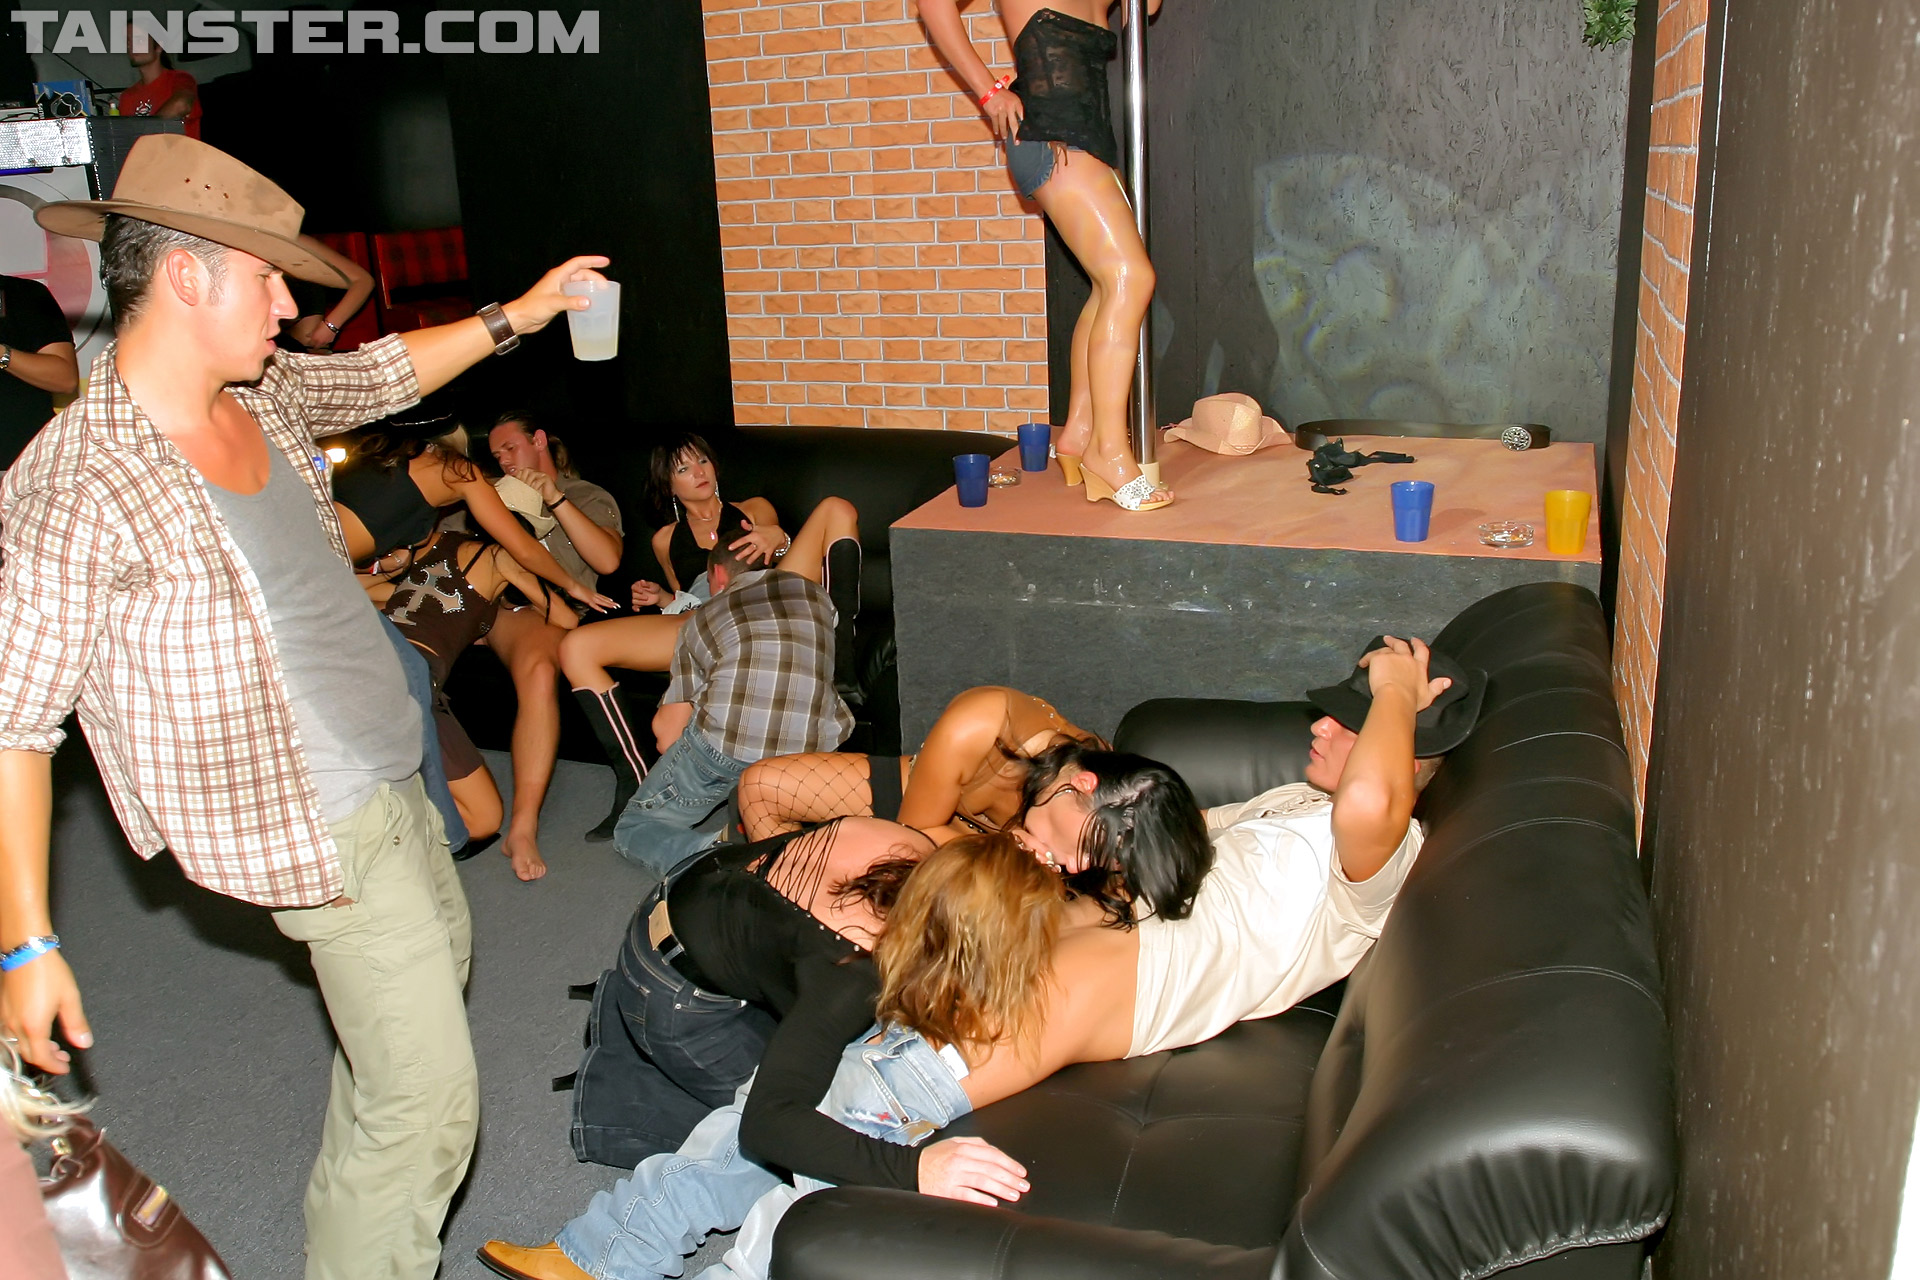 Lesbians doing cunnilingus